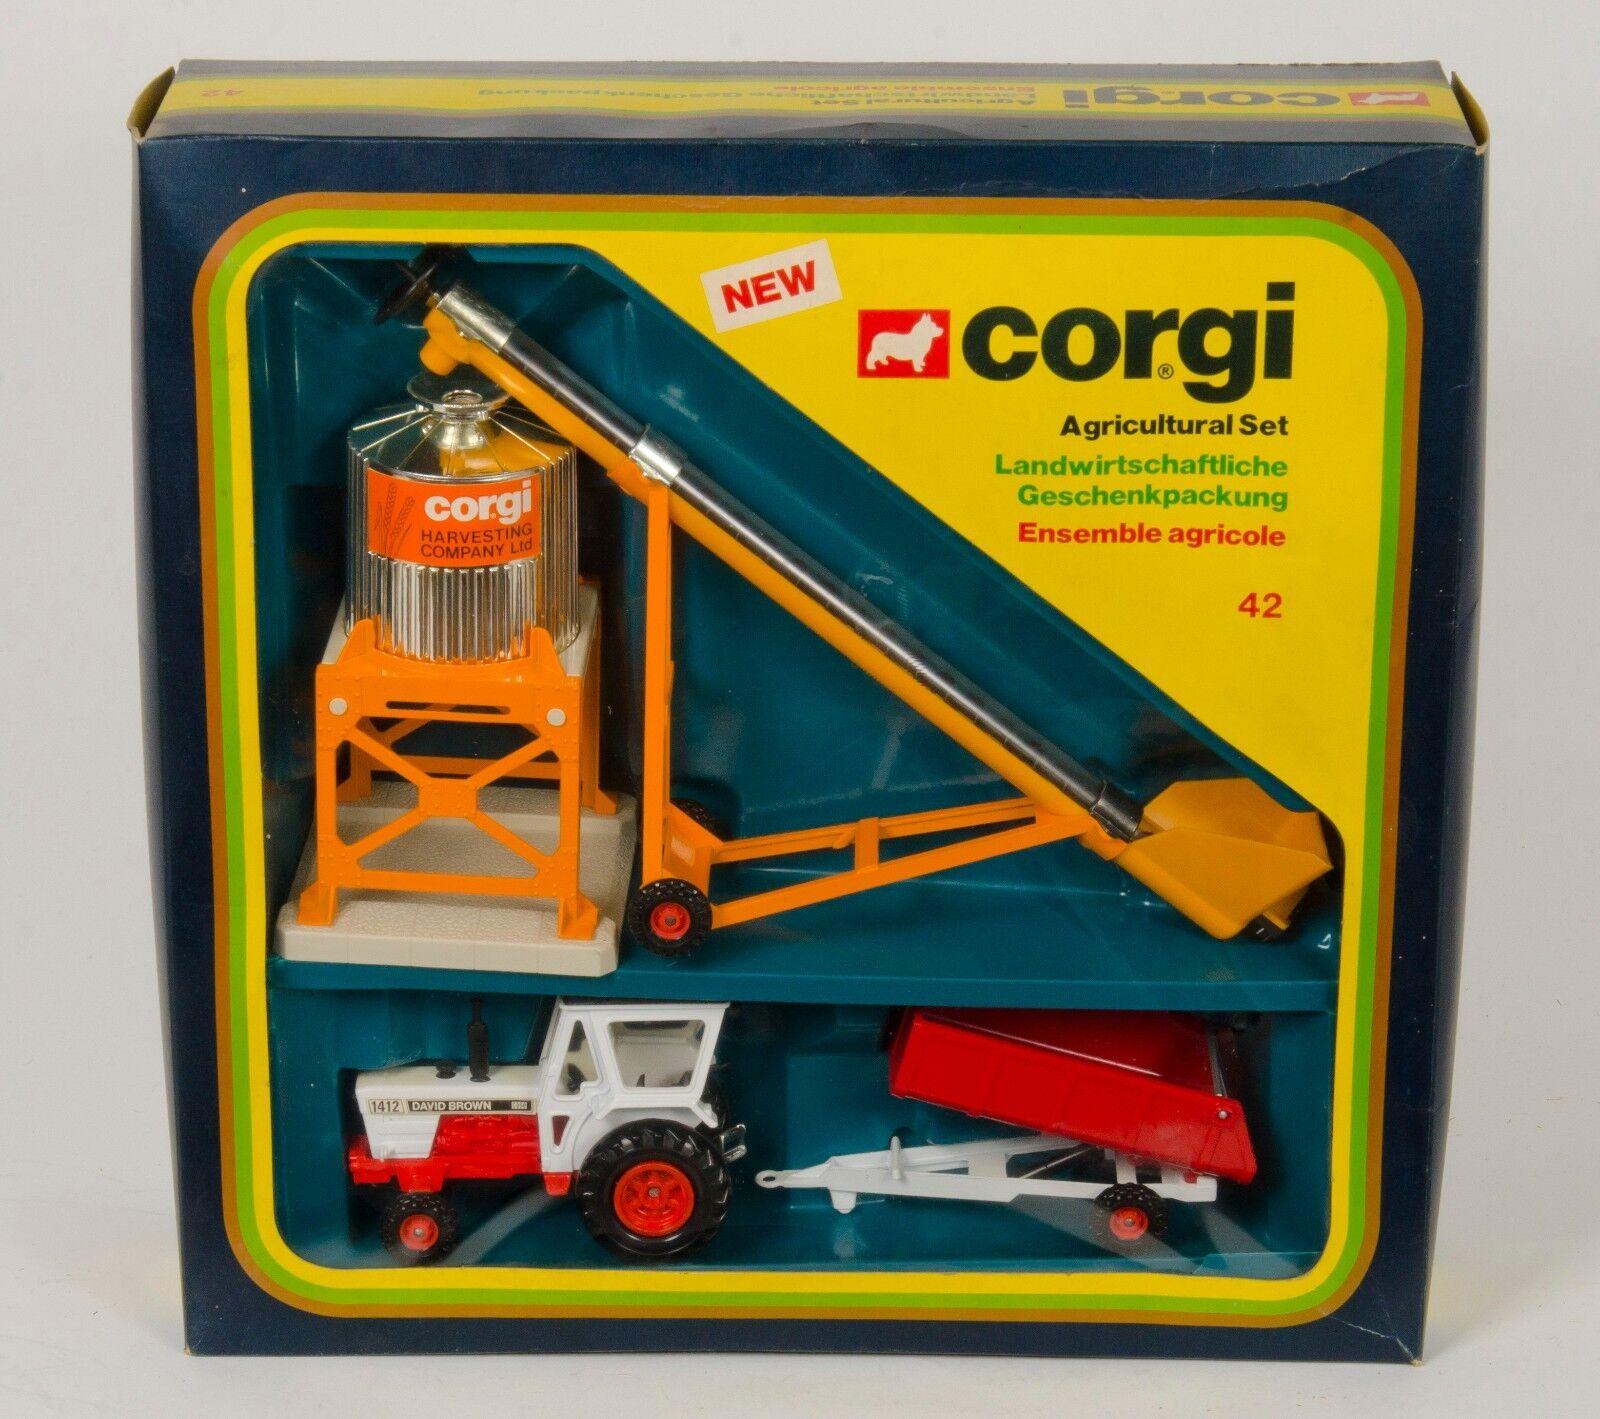 Corgi Gift Set 42 'Agricultural Set'. MINT Boxed. Original 1970's